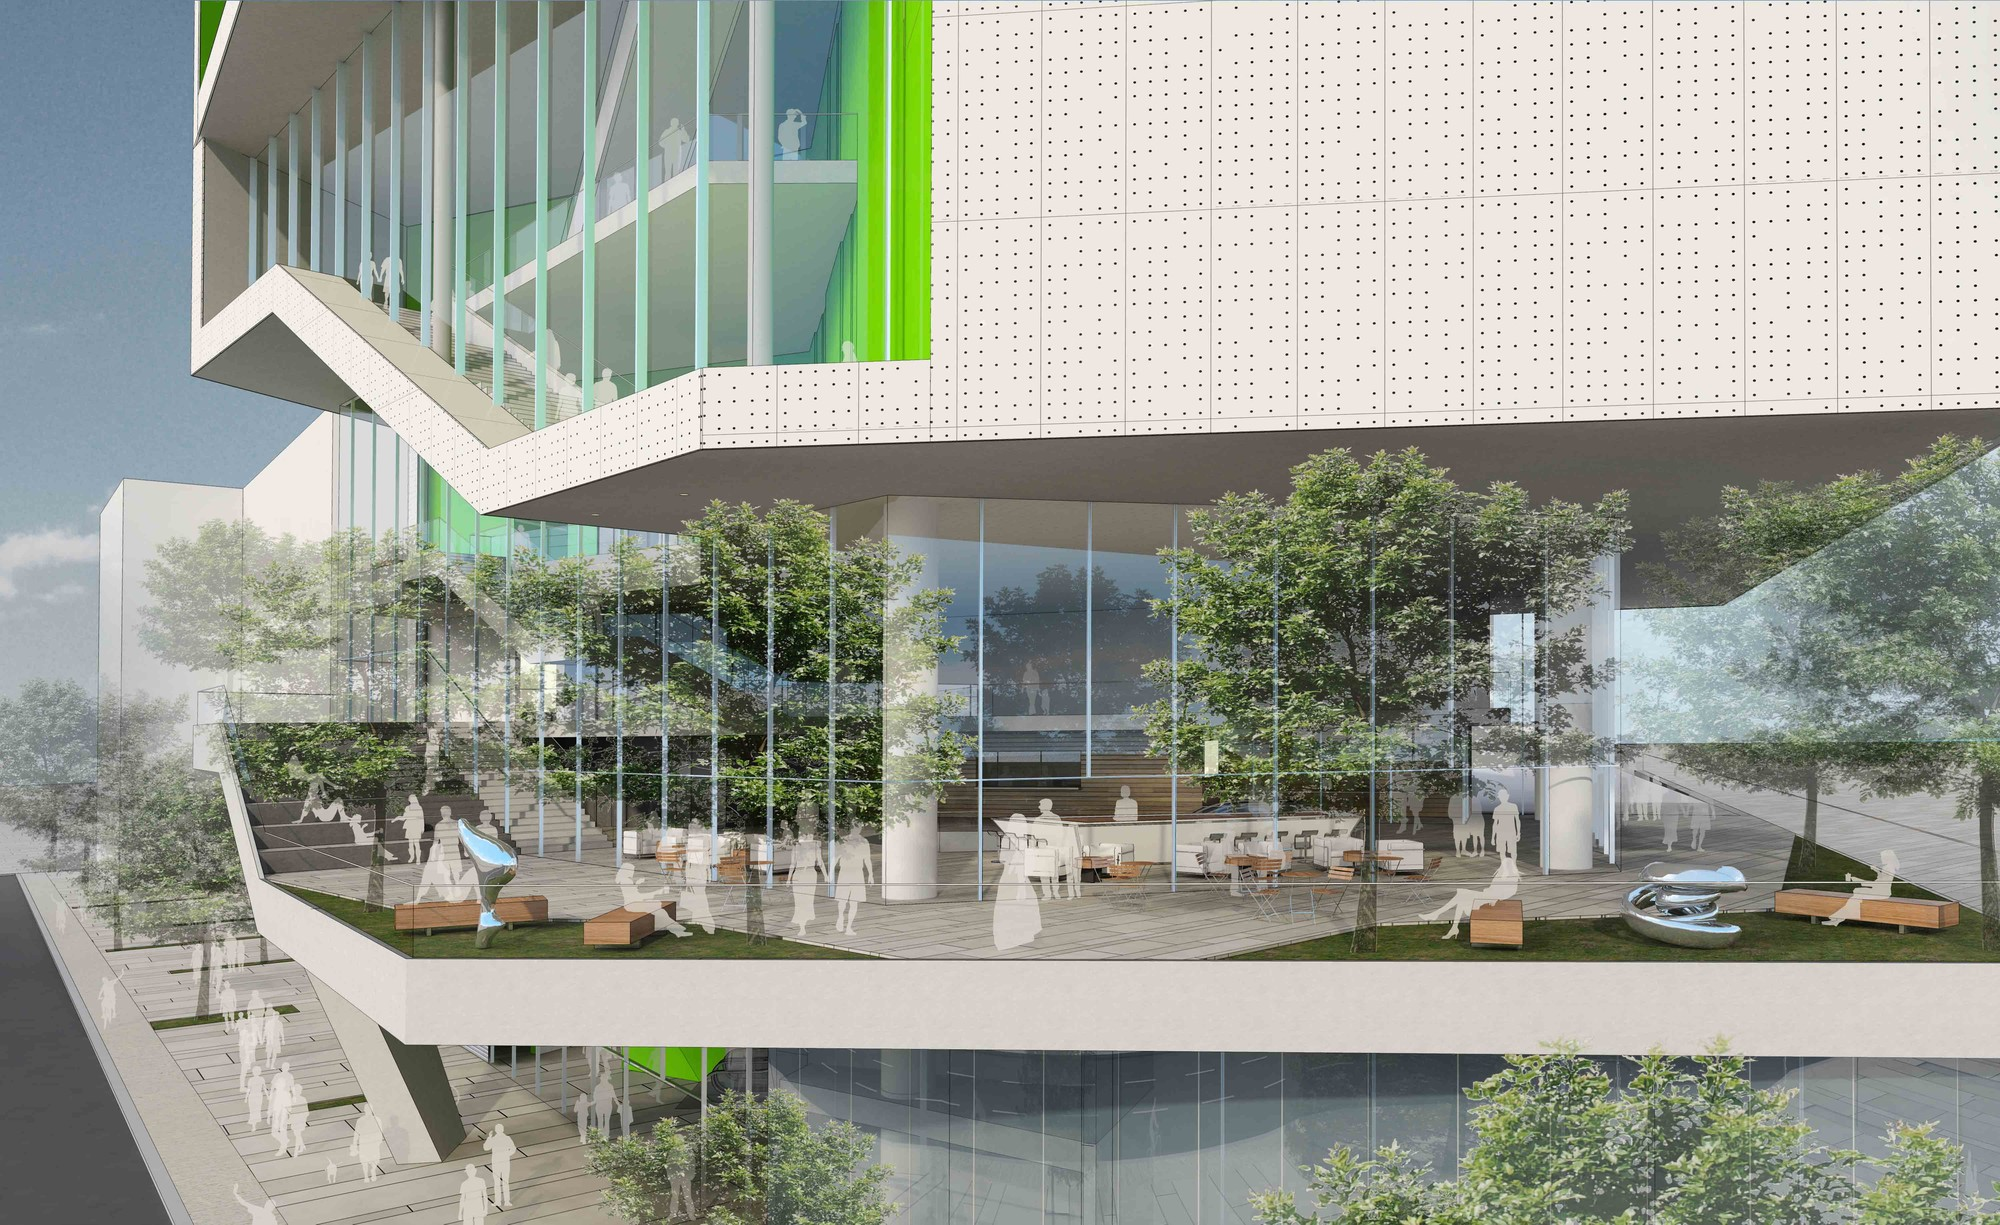 Gallery of Tel-Aviv White City Forum Winning Proposal